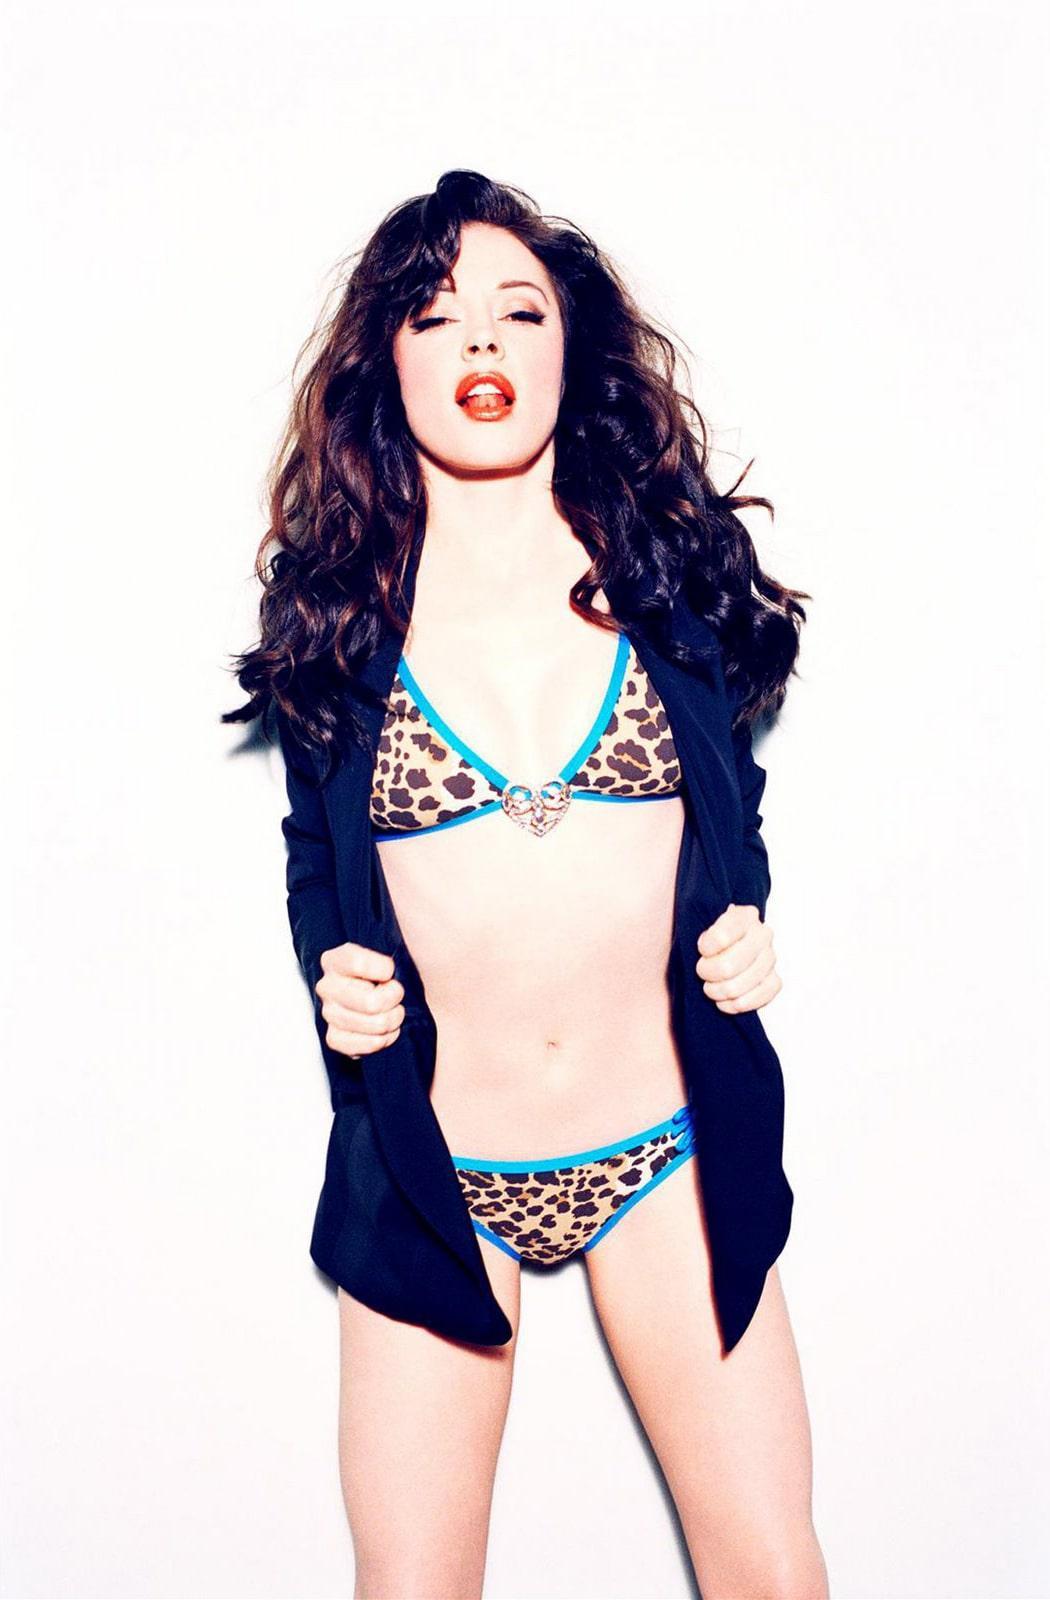 Rose McGowan sexy bikini pics